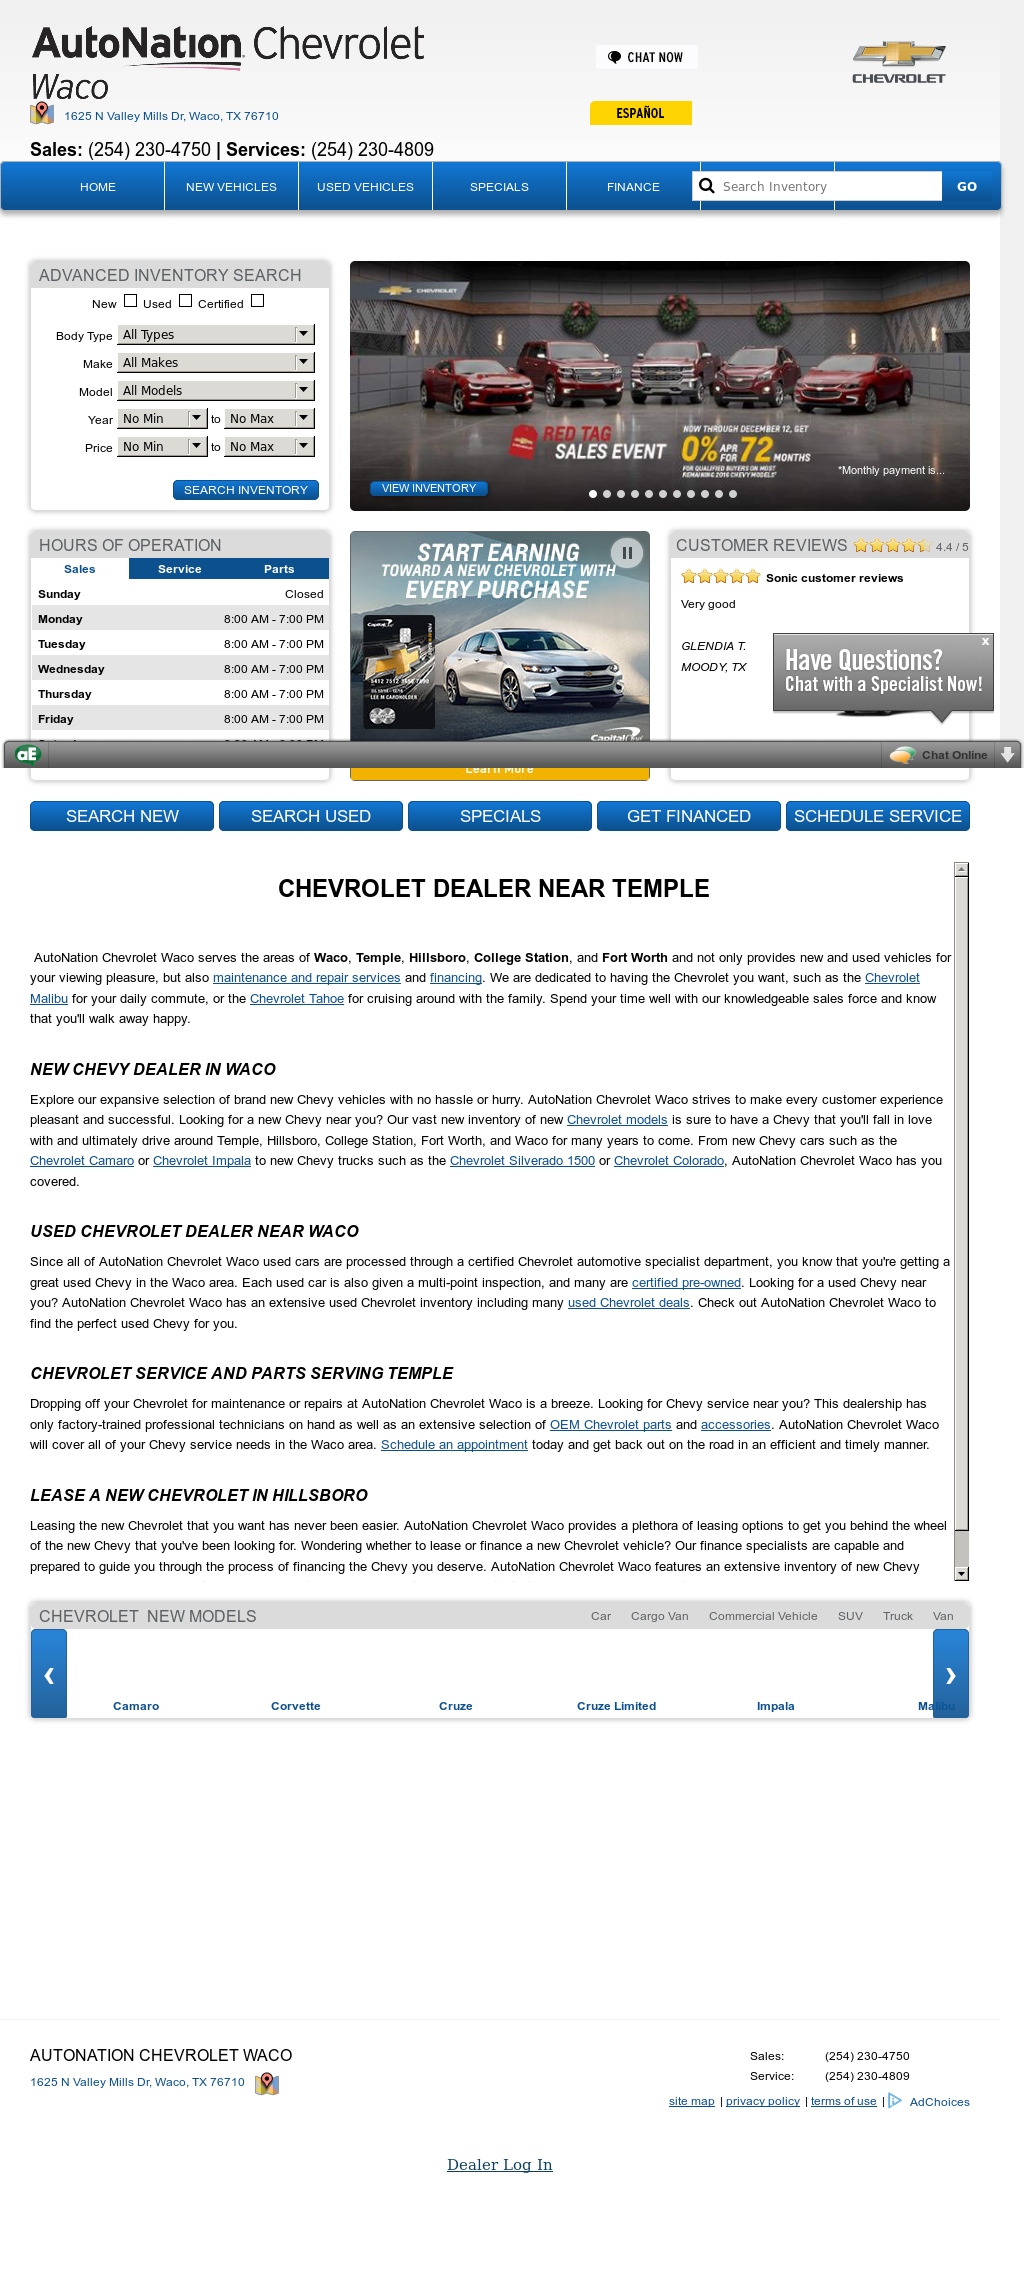 Allen Samuels Waco Chevrolet Competitors, Revenue And Employees   Owler  Company Profile